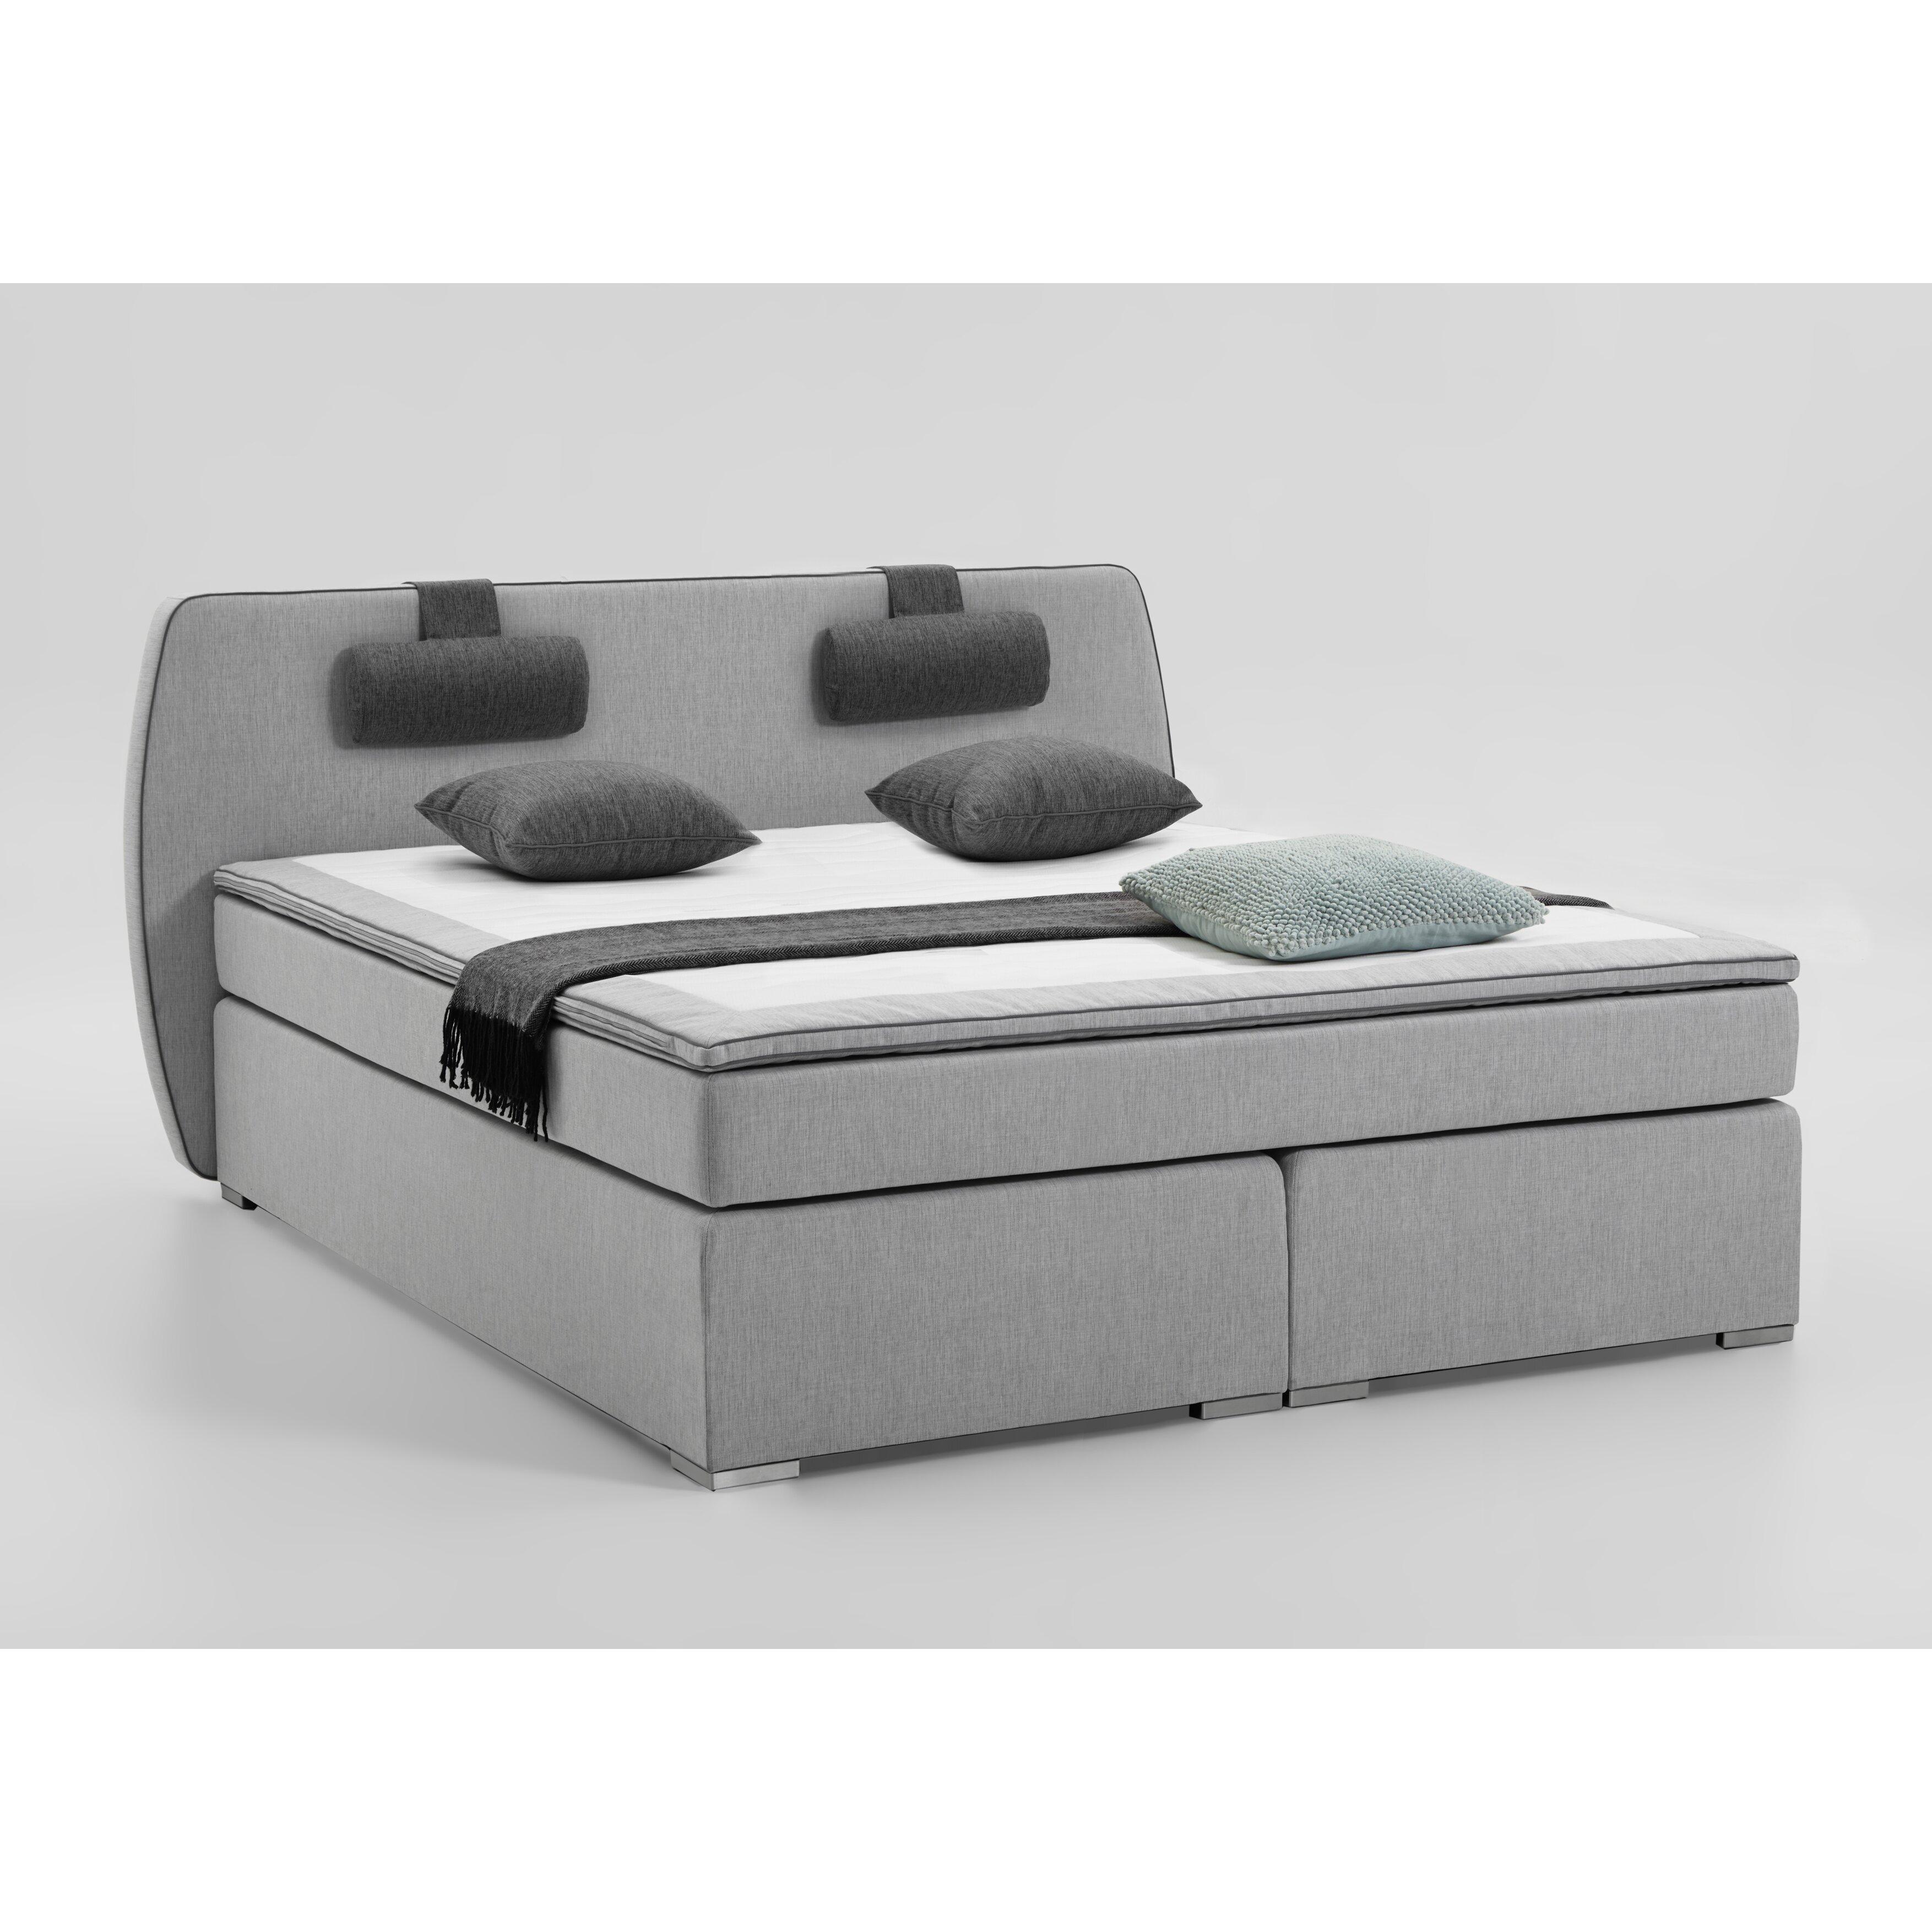 atlantic home collection boxspringbett rex mit topper und. Black Bedroom Furniture Sets. Home Design Ideas